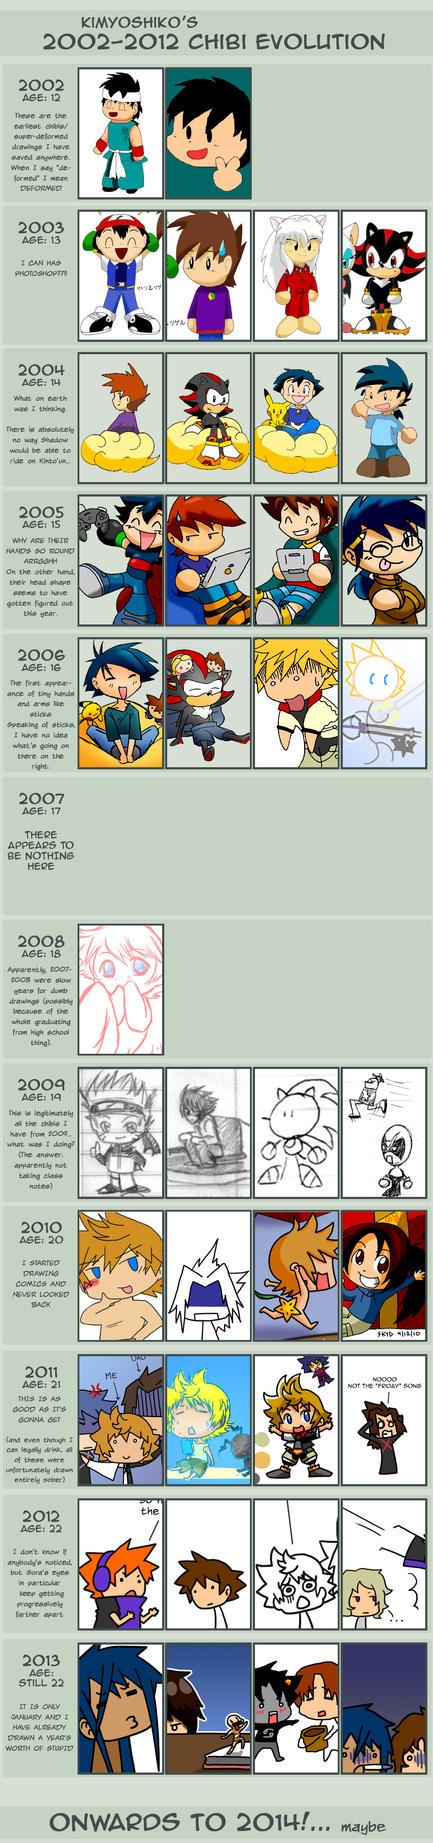 2002-13 Improvement Meme - Chibis by KimYoshiko